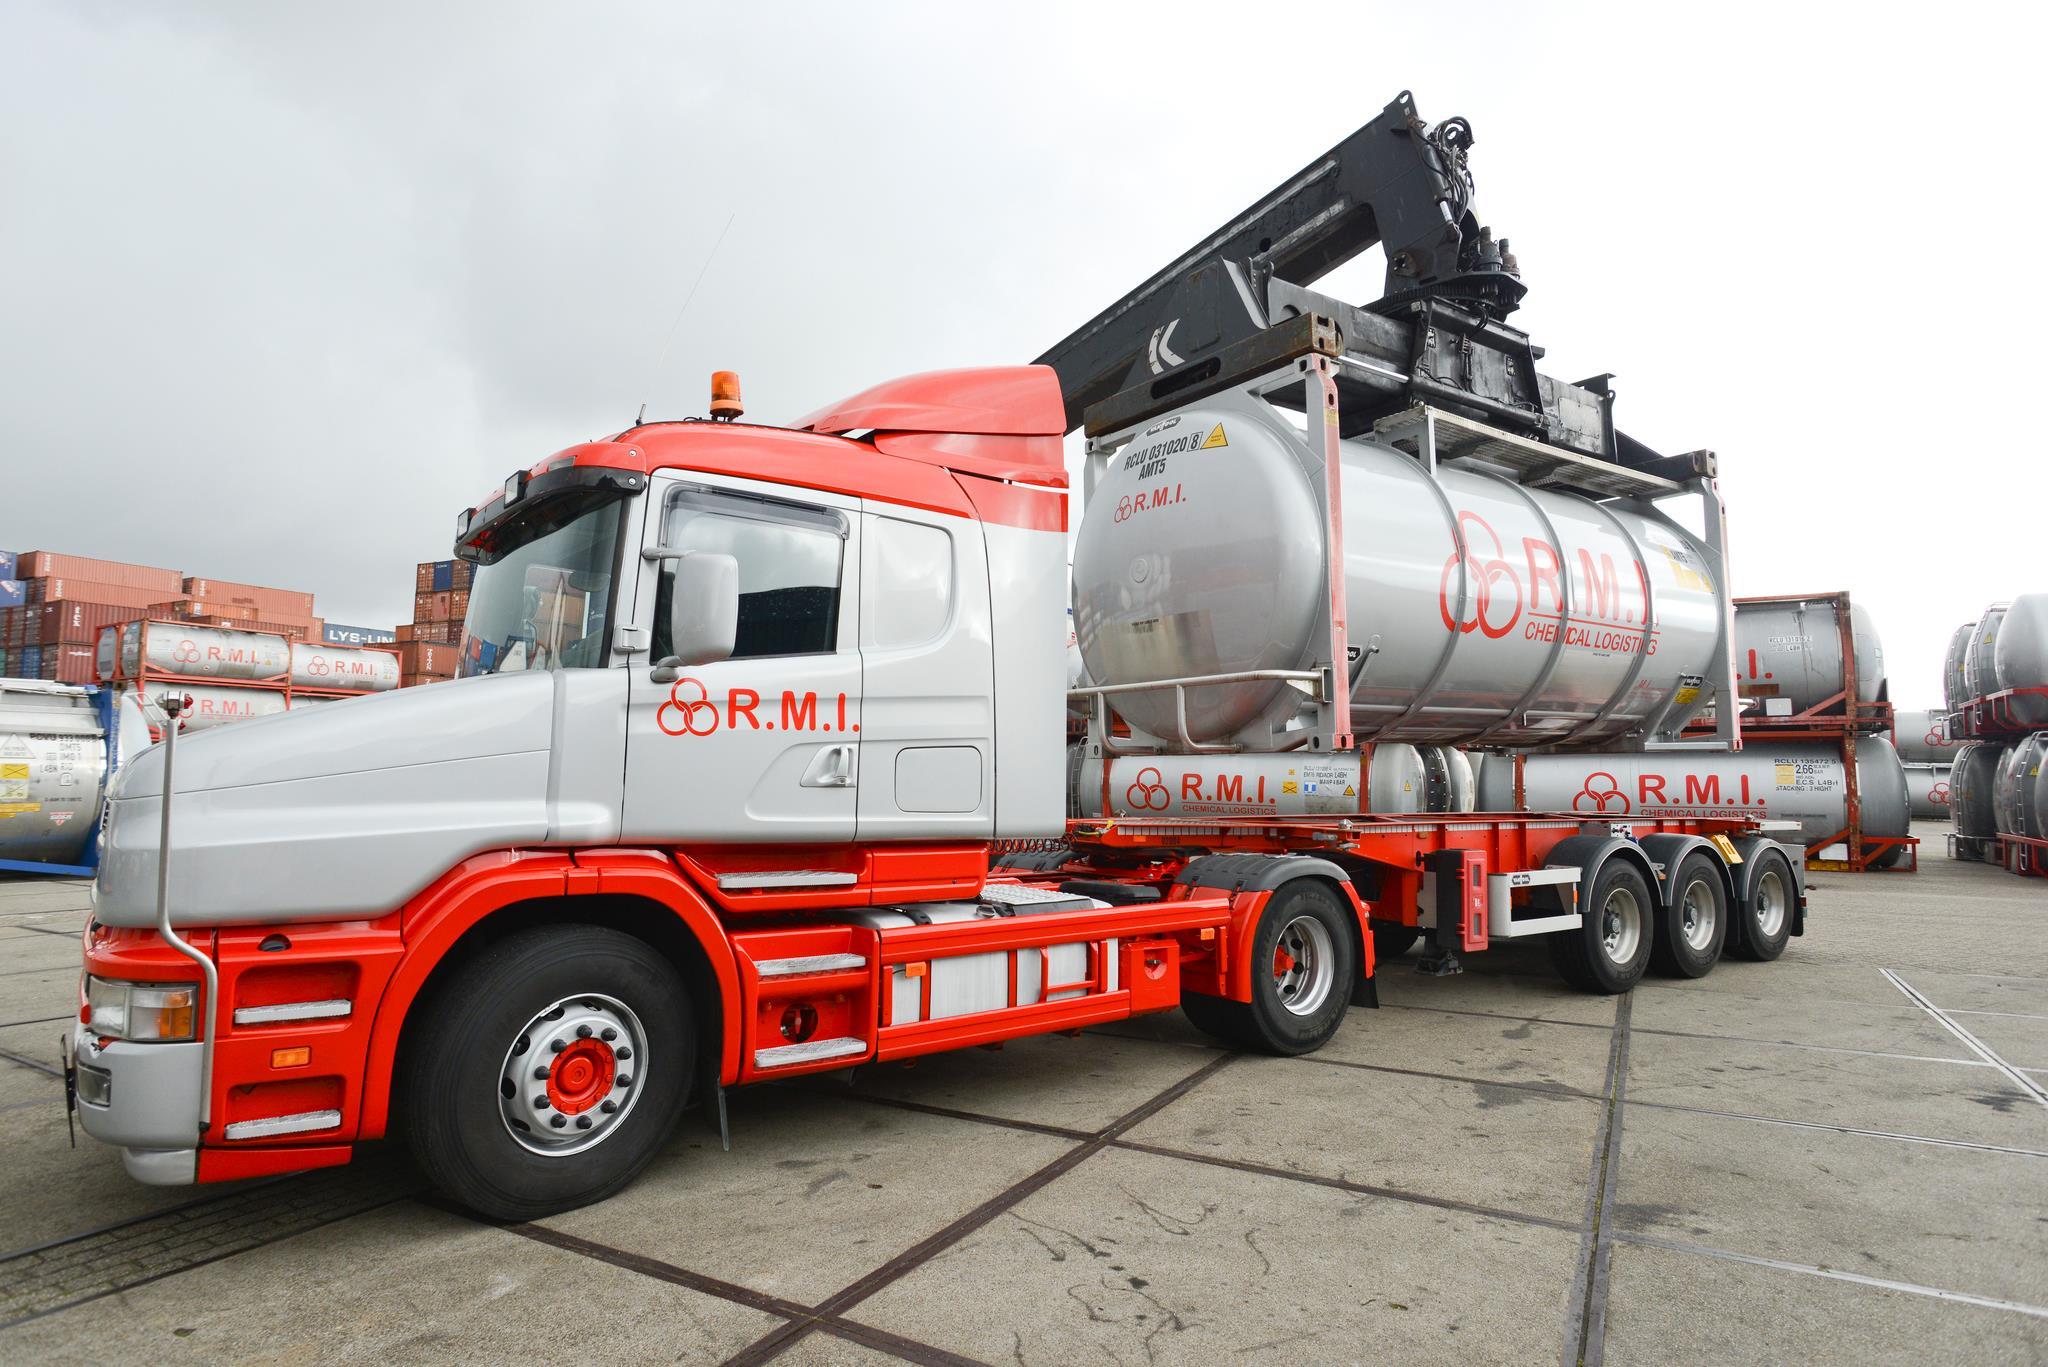 R.M.I. Global Logistics Services